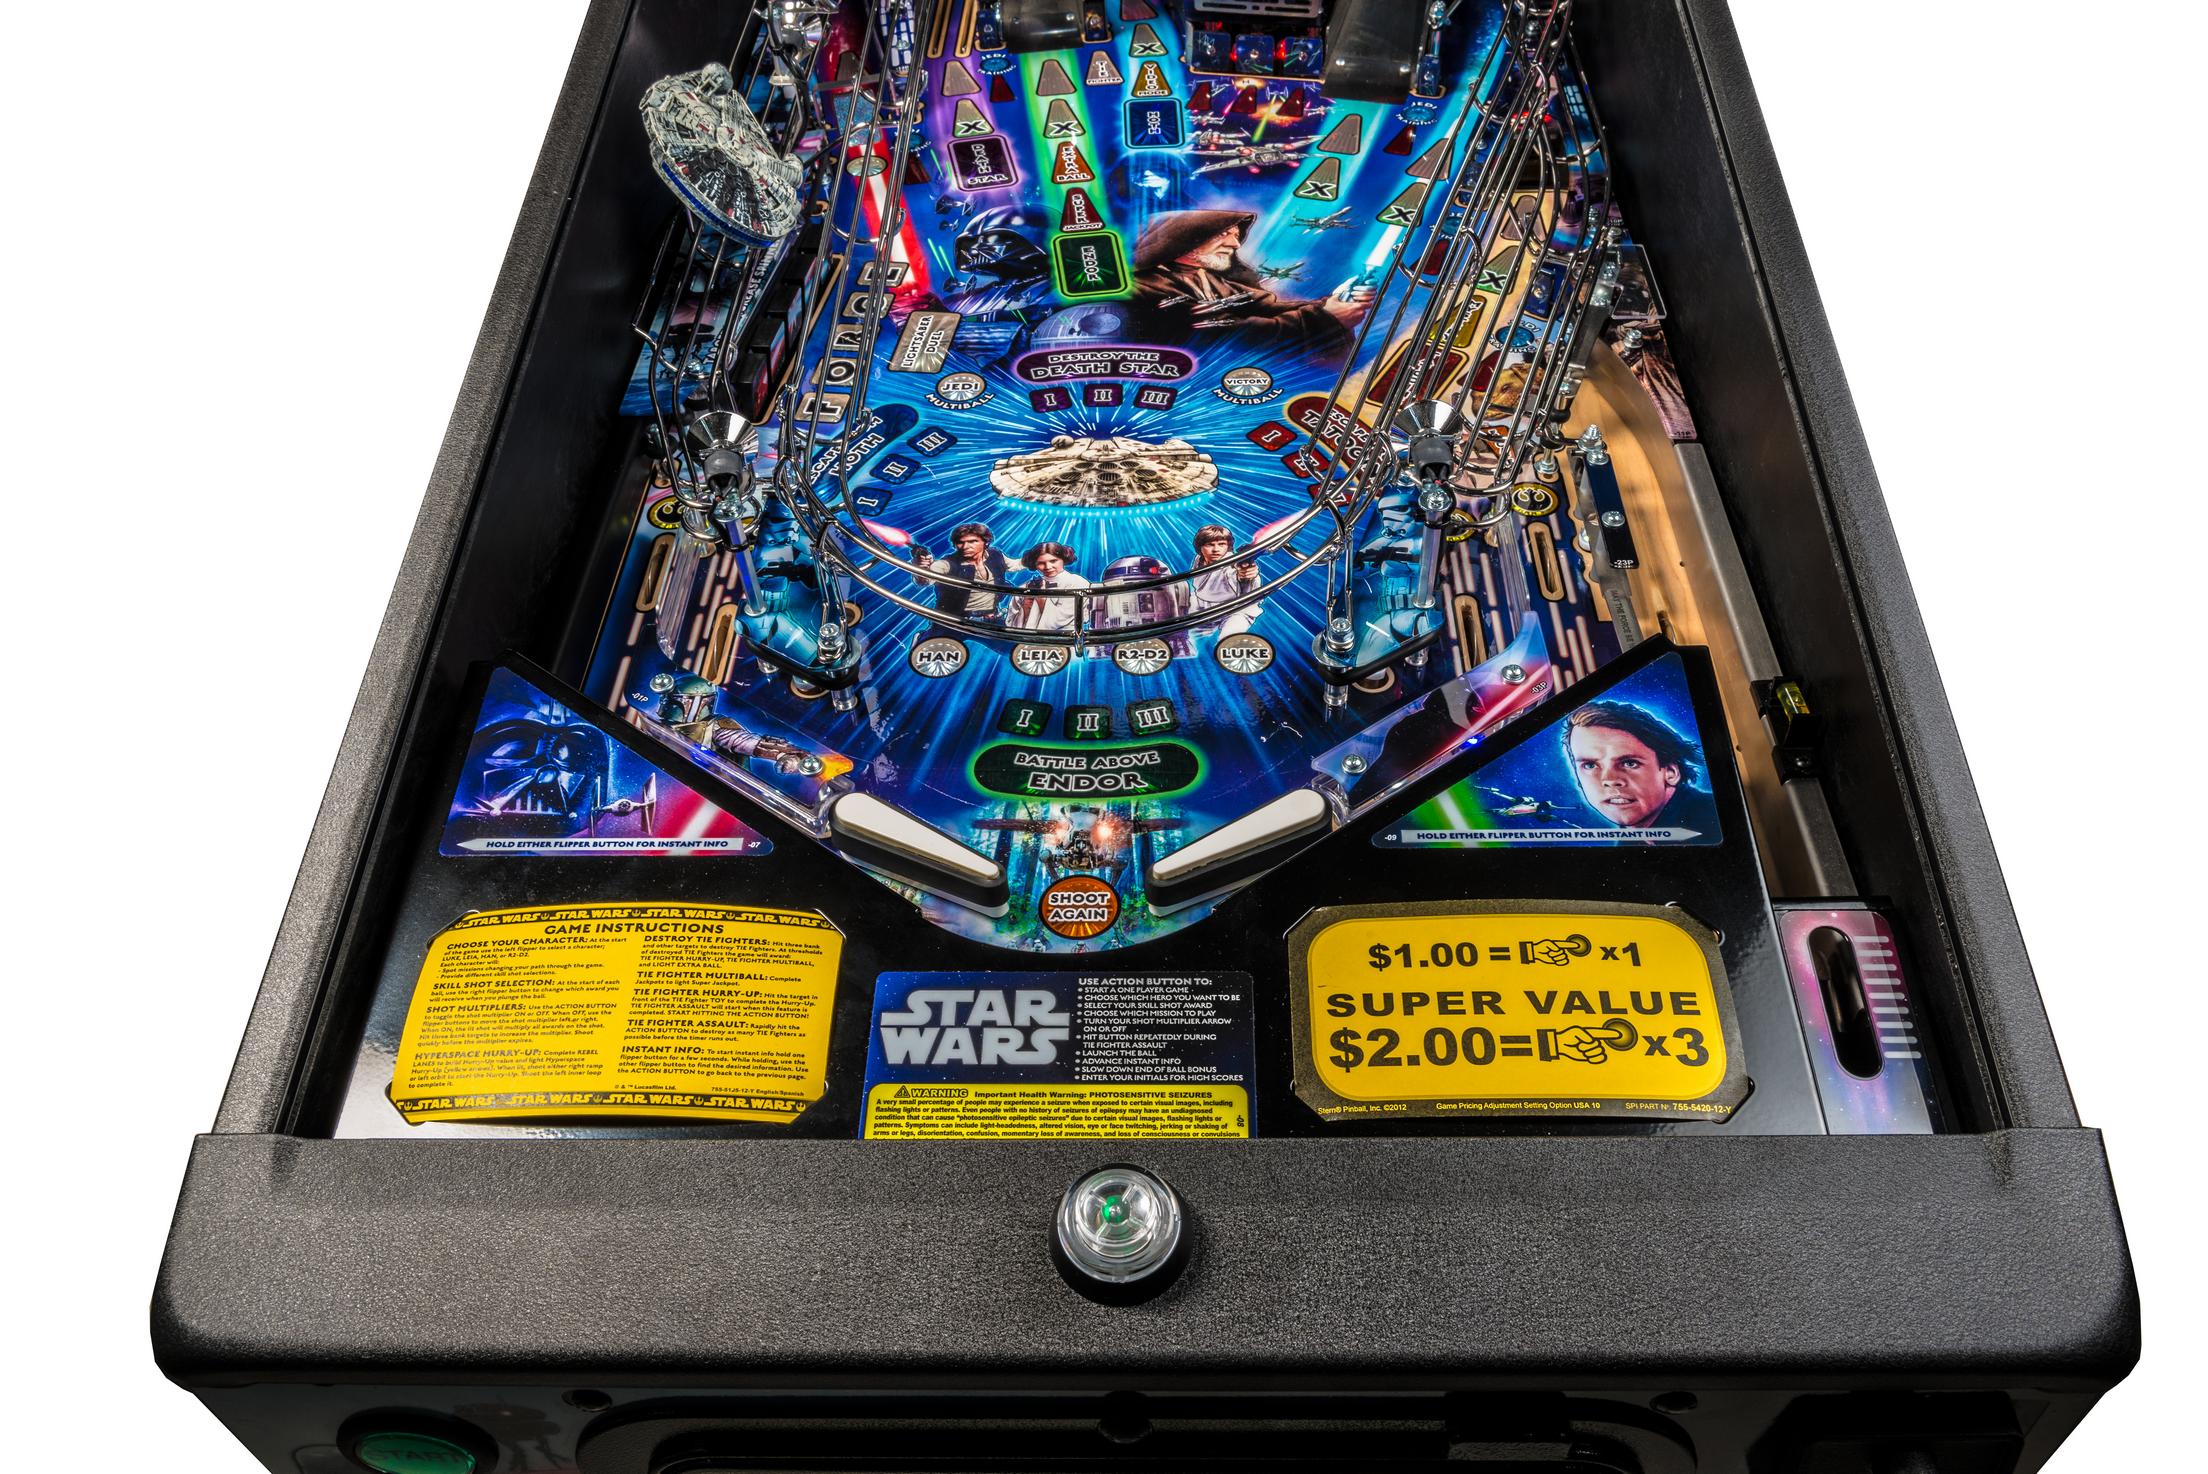 Star Wars Pinball Machine >> Star Wars Stern Pinball